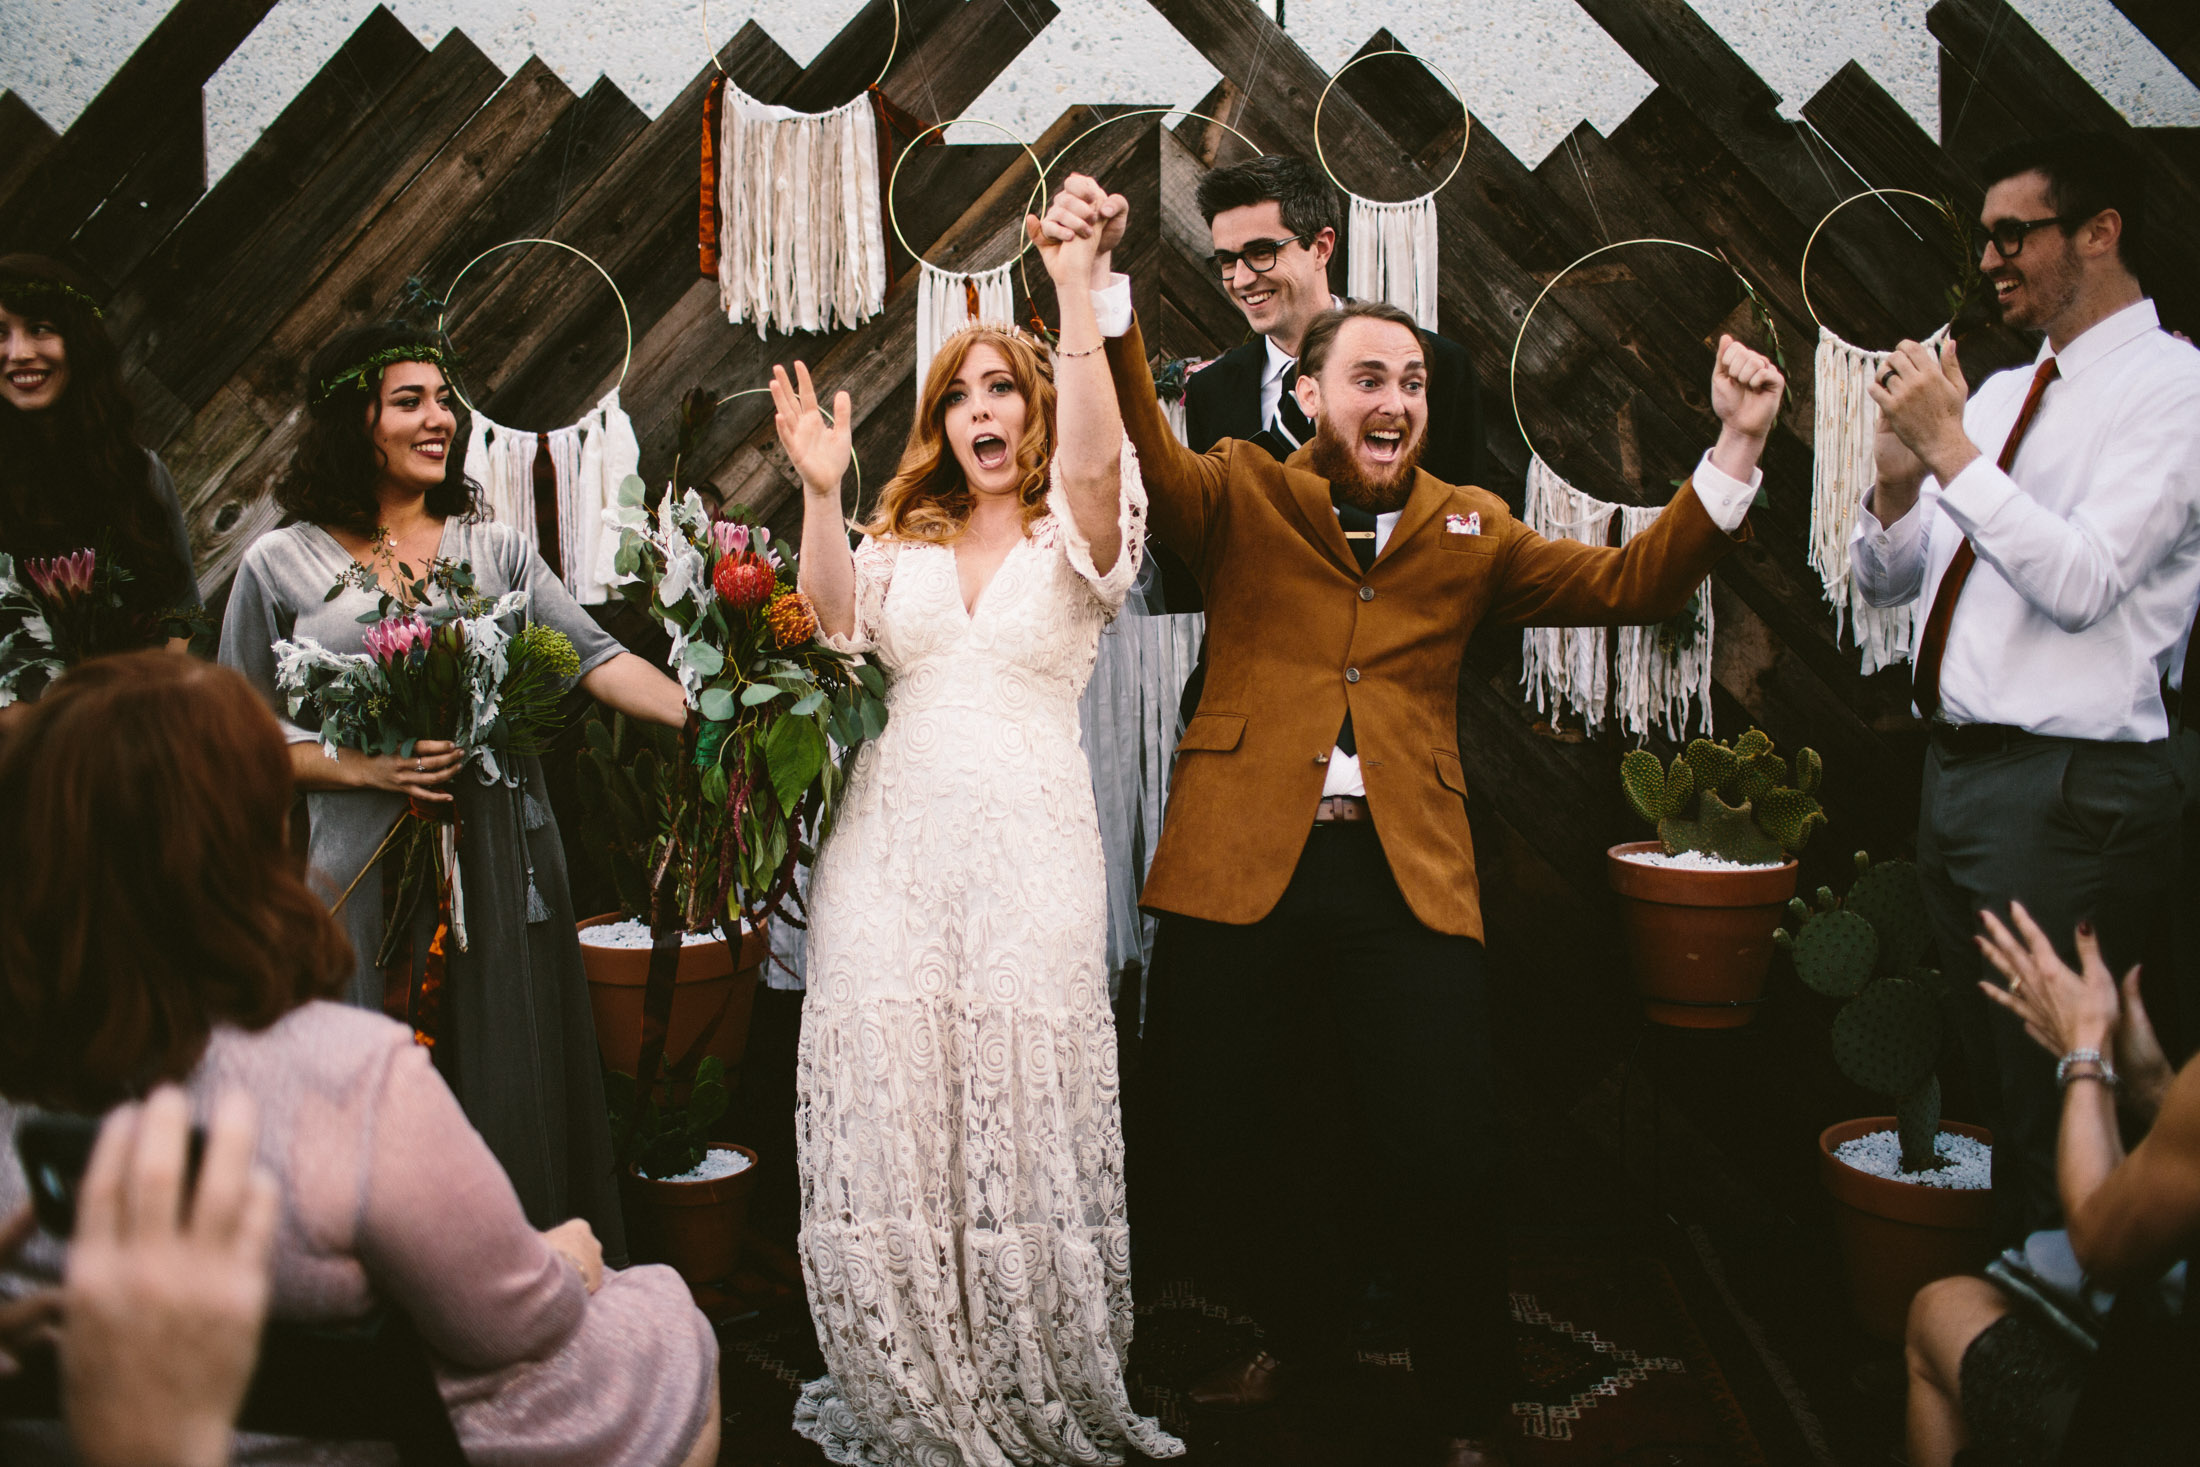 The-woodshed-booze-brothers-venue-wedding-82.jpg